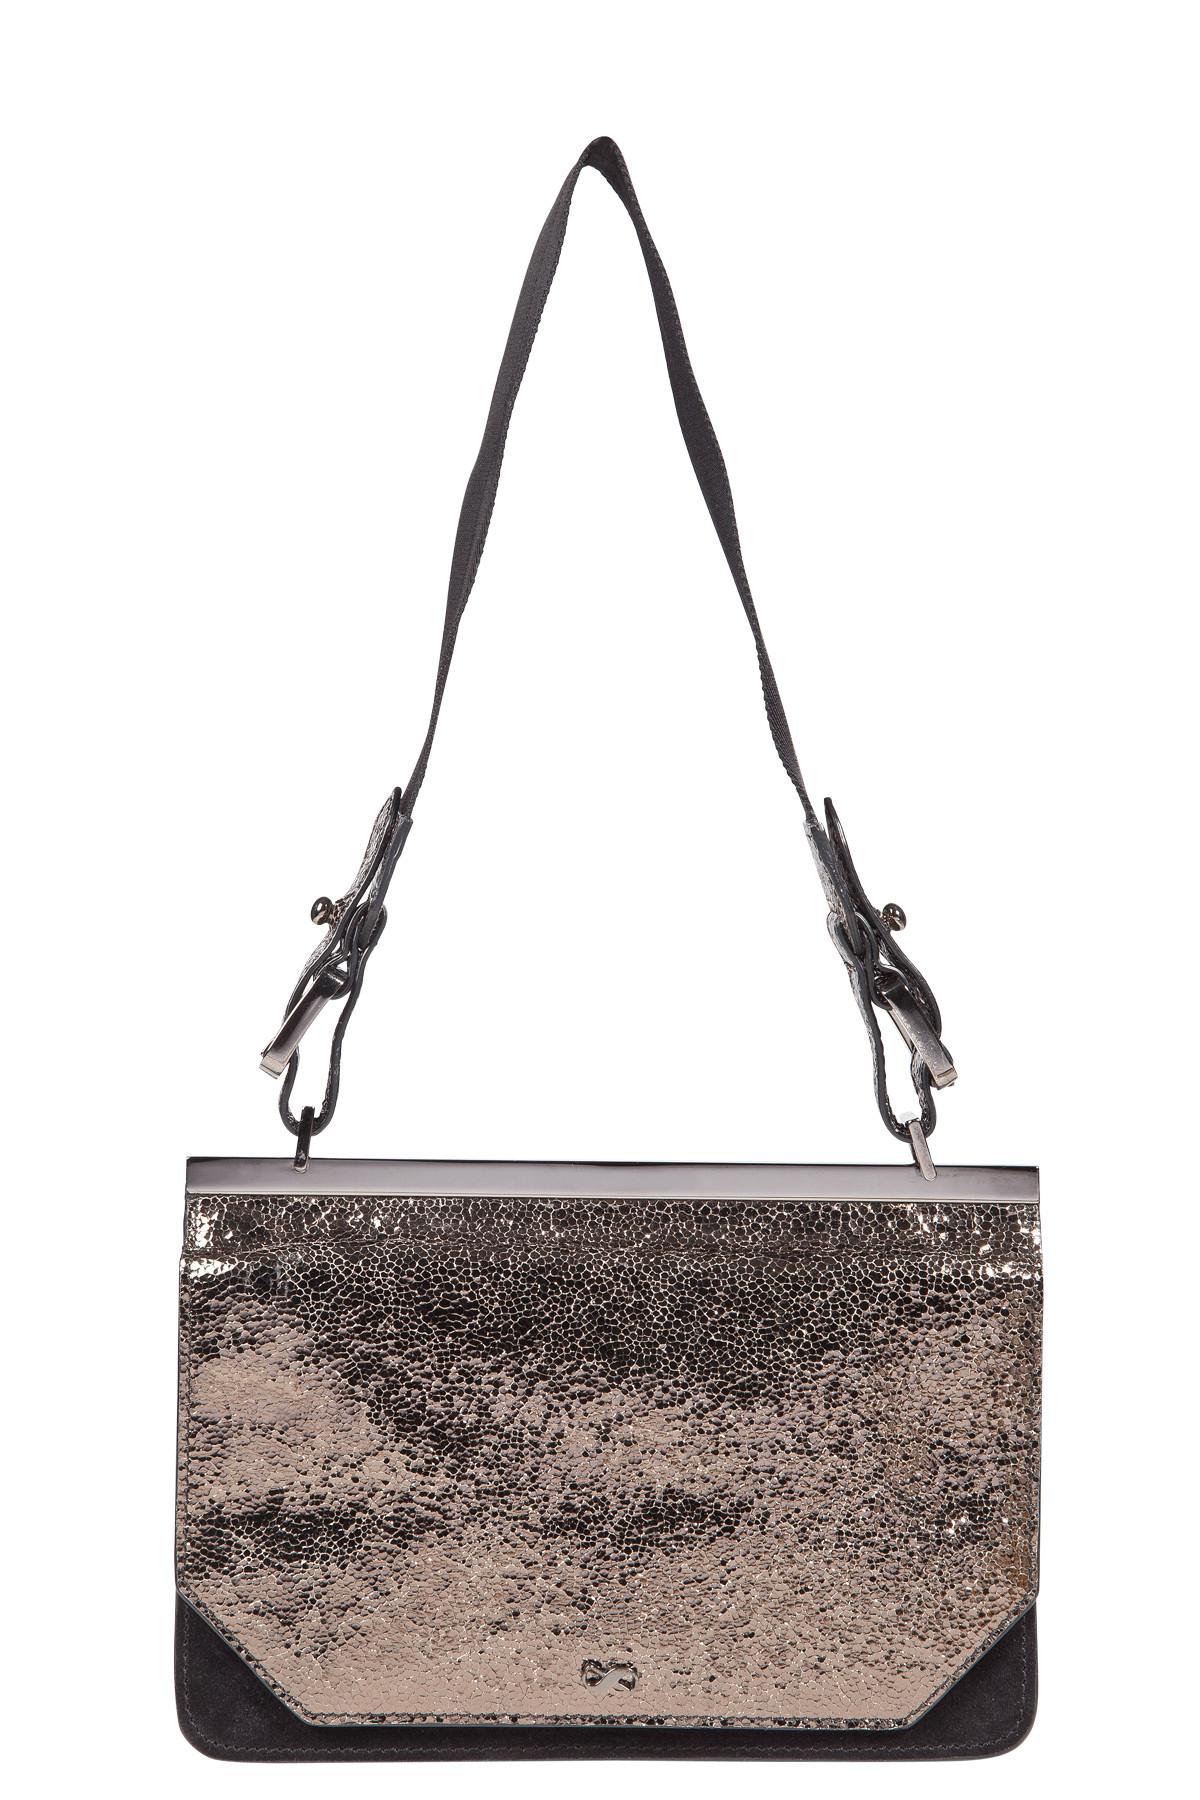 STUDDED ATTITUDE piercing detail neoprene bag with key chain decoration Dorothee Schumacher myxO29